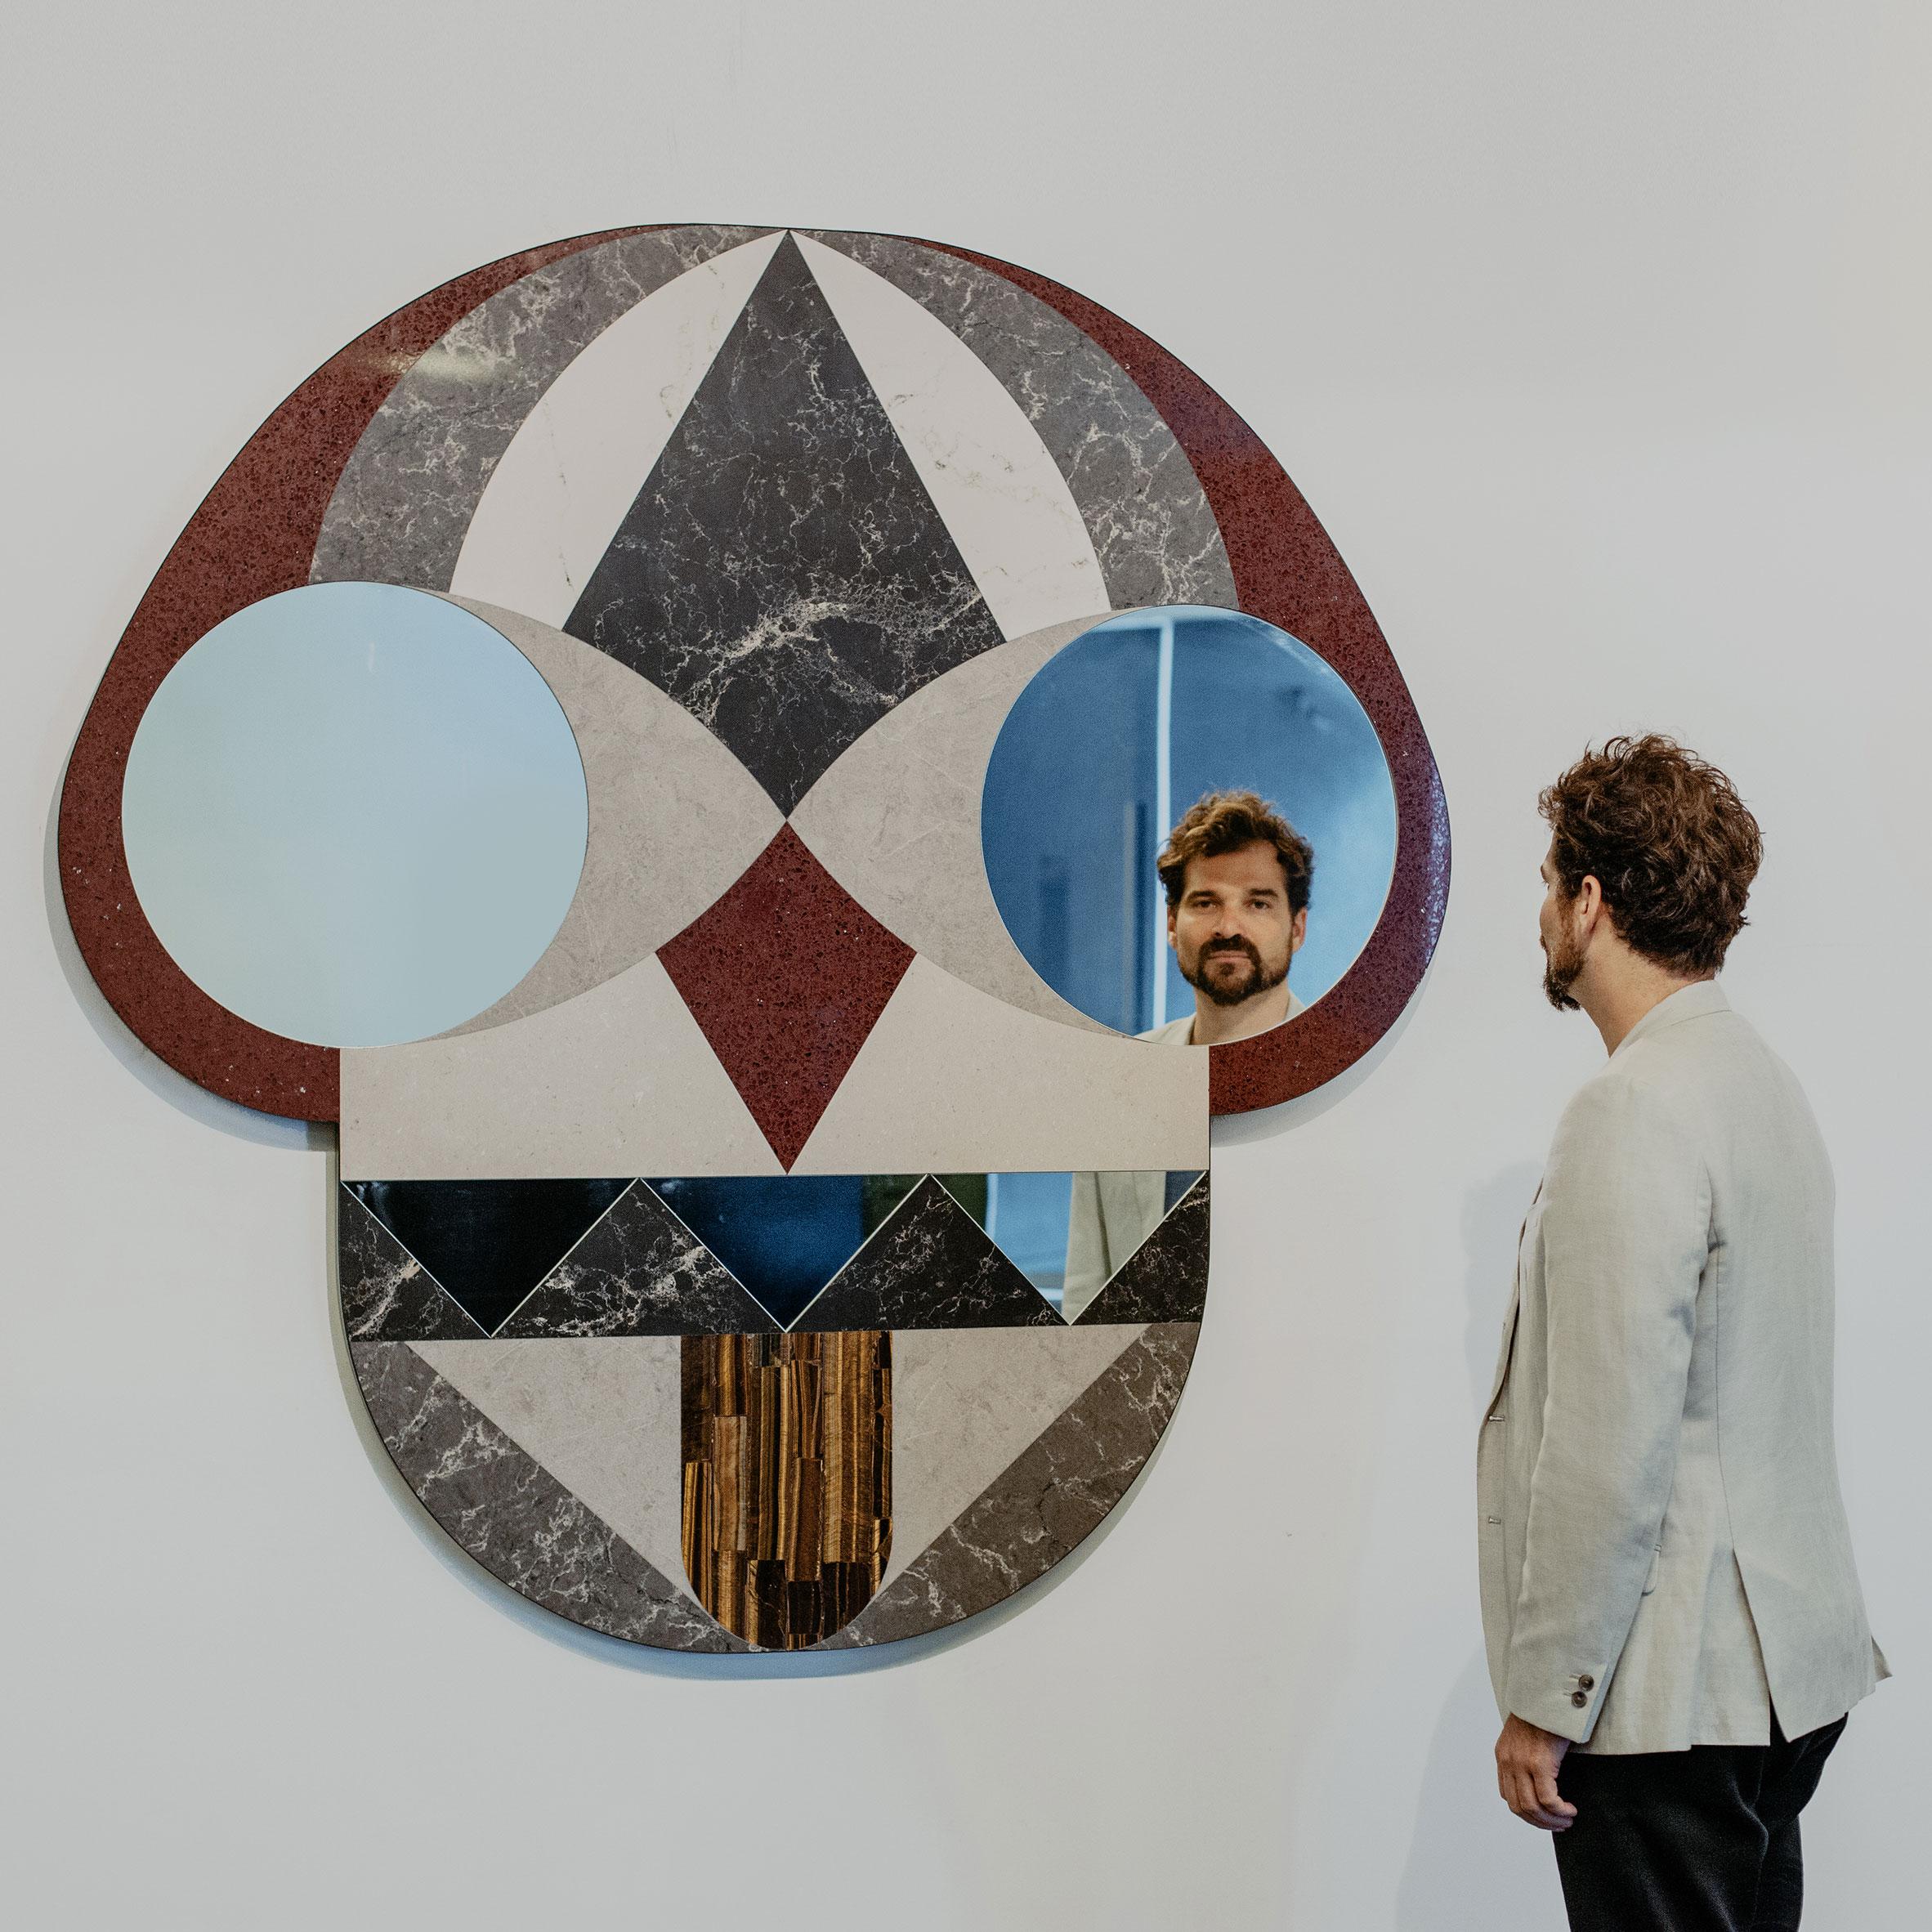 Jaime Hayon's mirror for Caesarstone